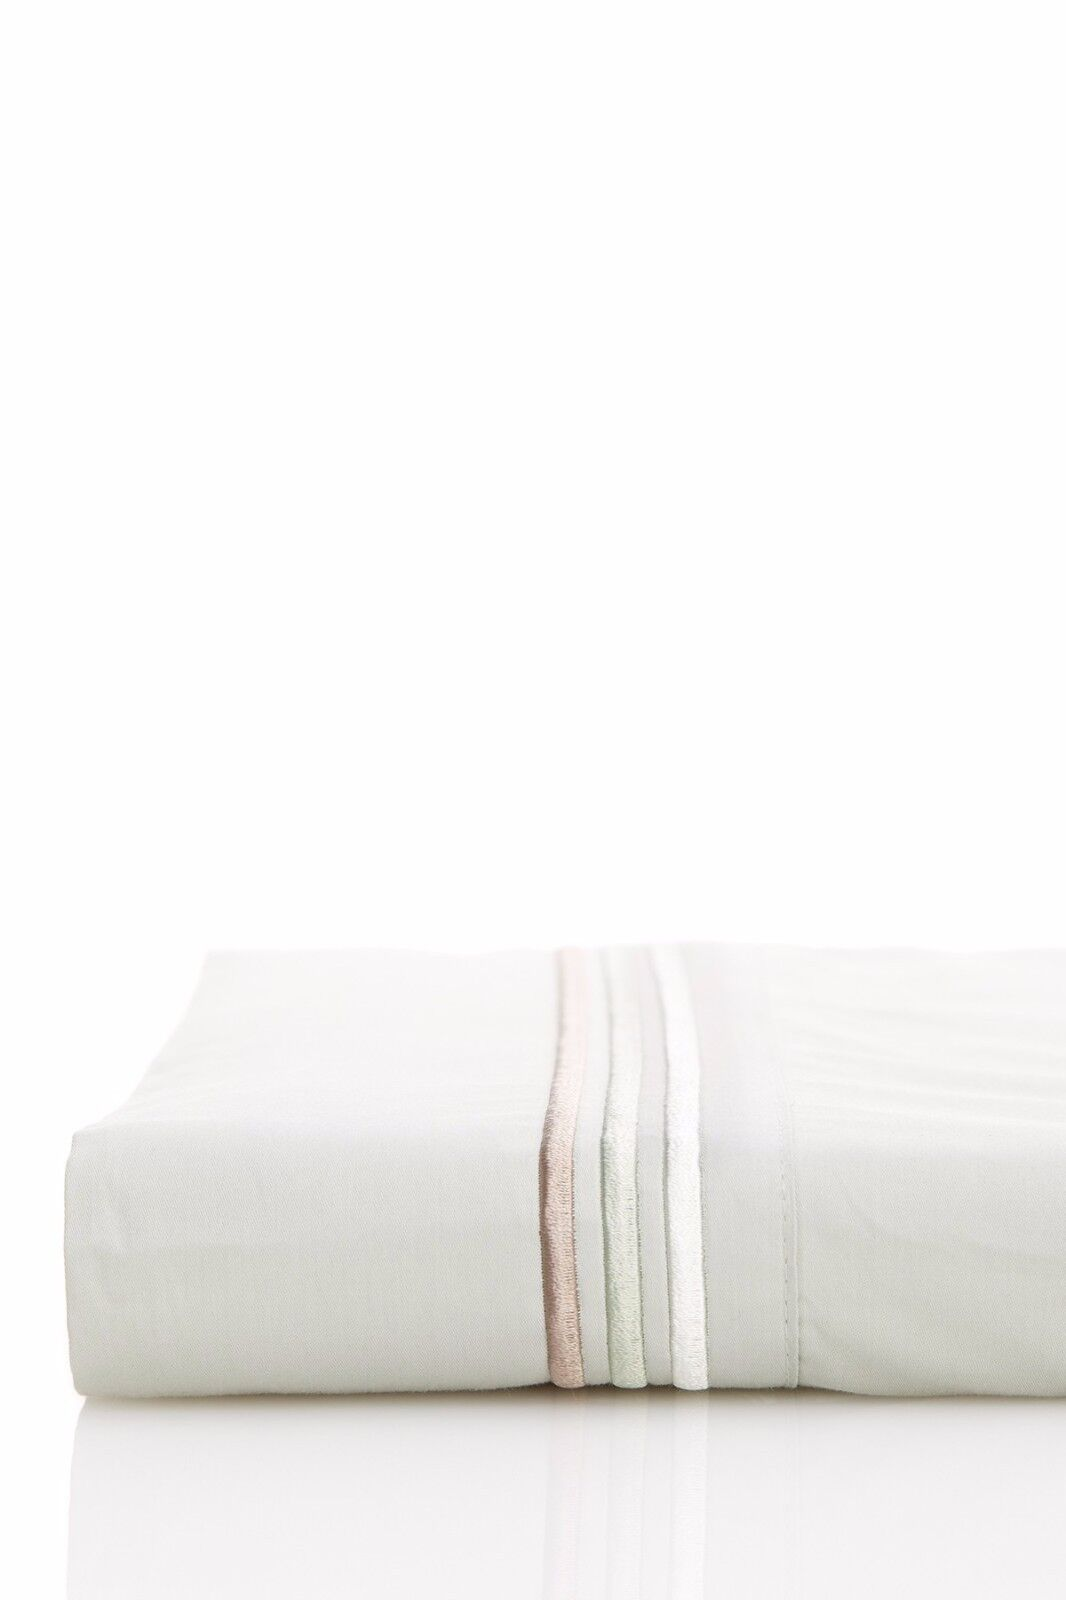 NWT Hugo Boss Classiques Jade Green QUEEN Flat Sheet MSRP $164